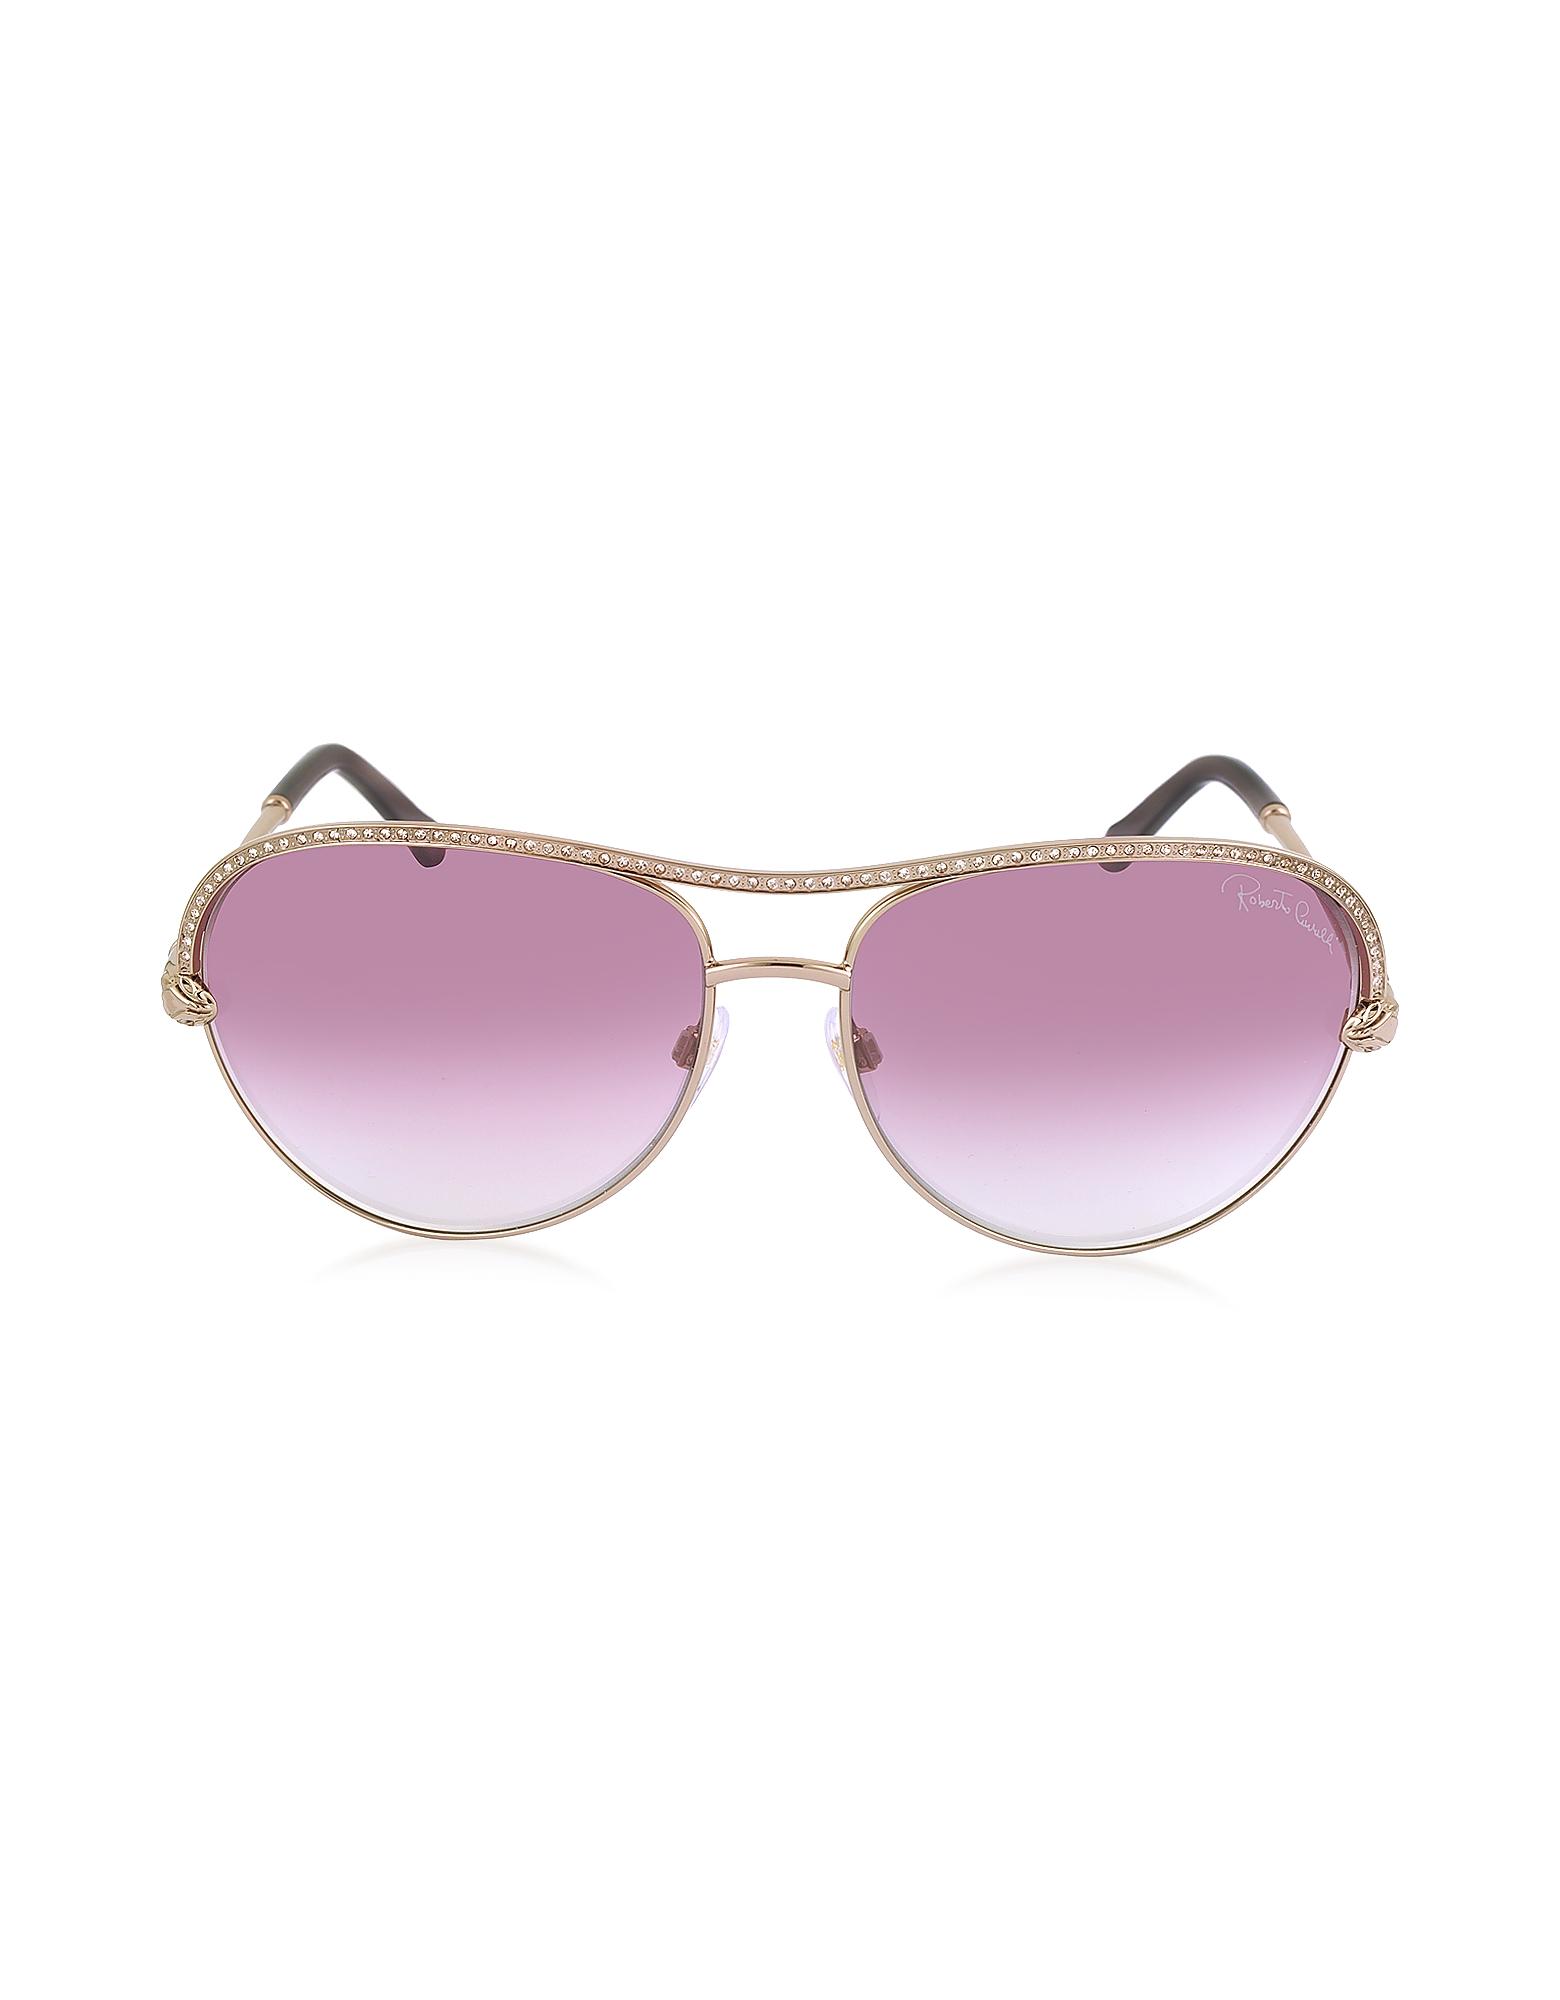 Roberto Cavalli Sunglasses, VEGA 1011 Metal Aviator Women's Sunglasses w/Crystals